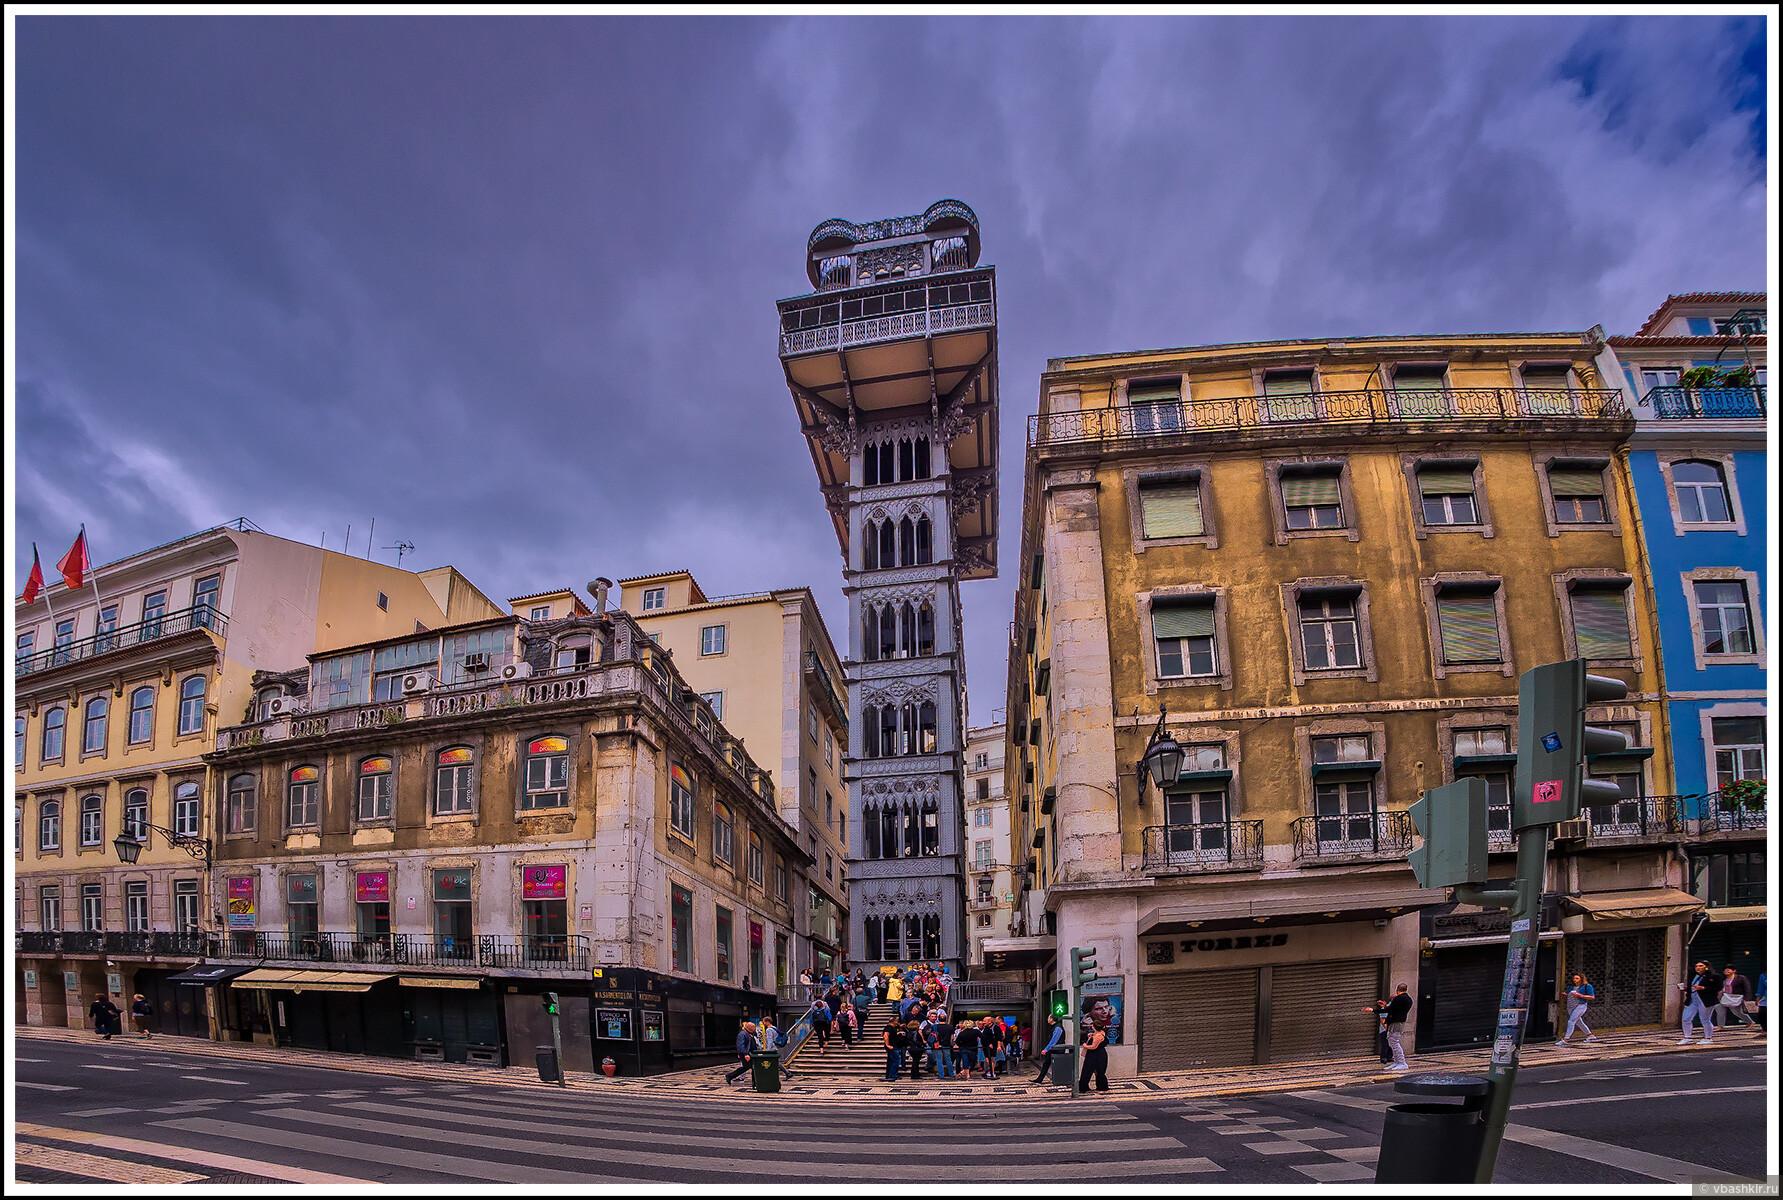 Элевадор-ди-Санта-Жушта. Лиссабон., Я и лаг у троп. Португалия! (палиндром)